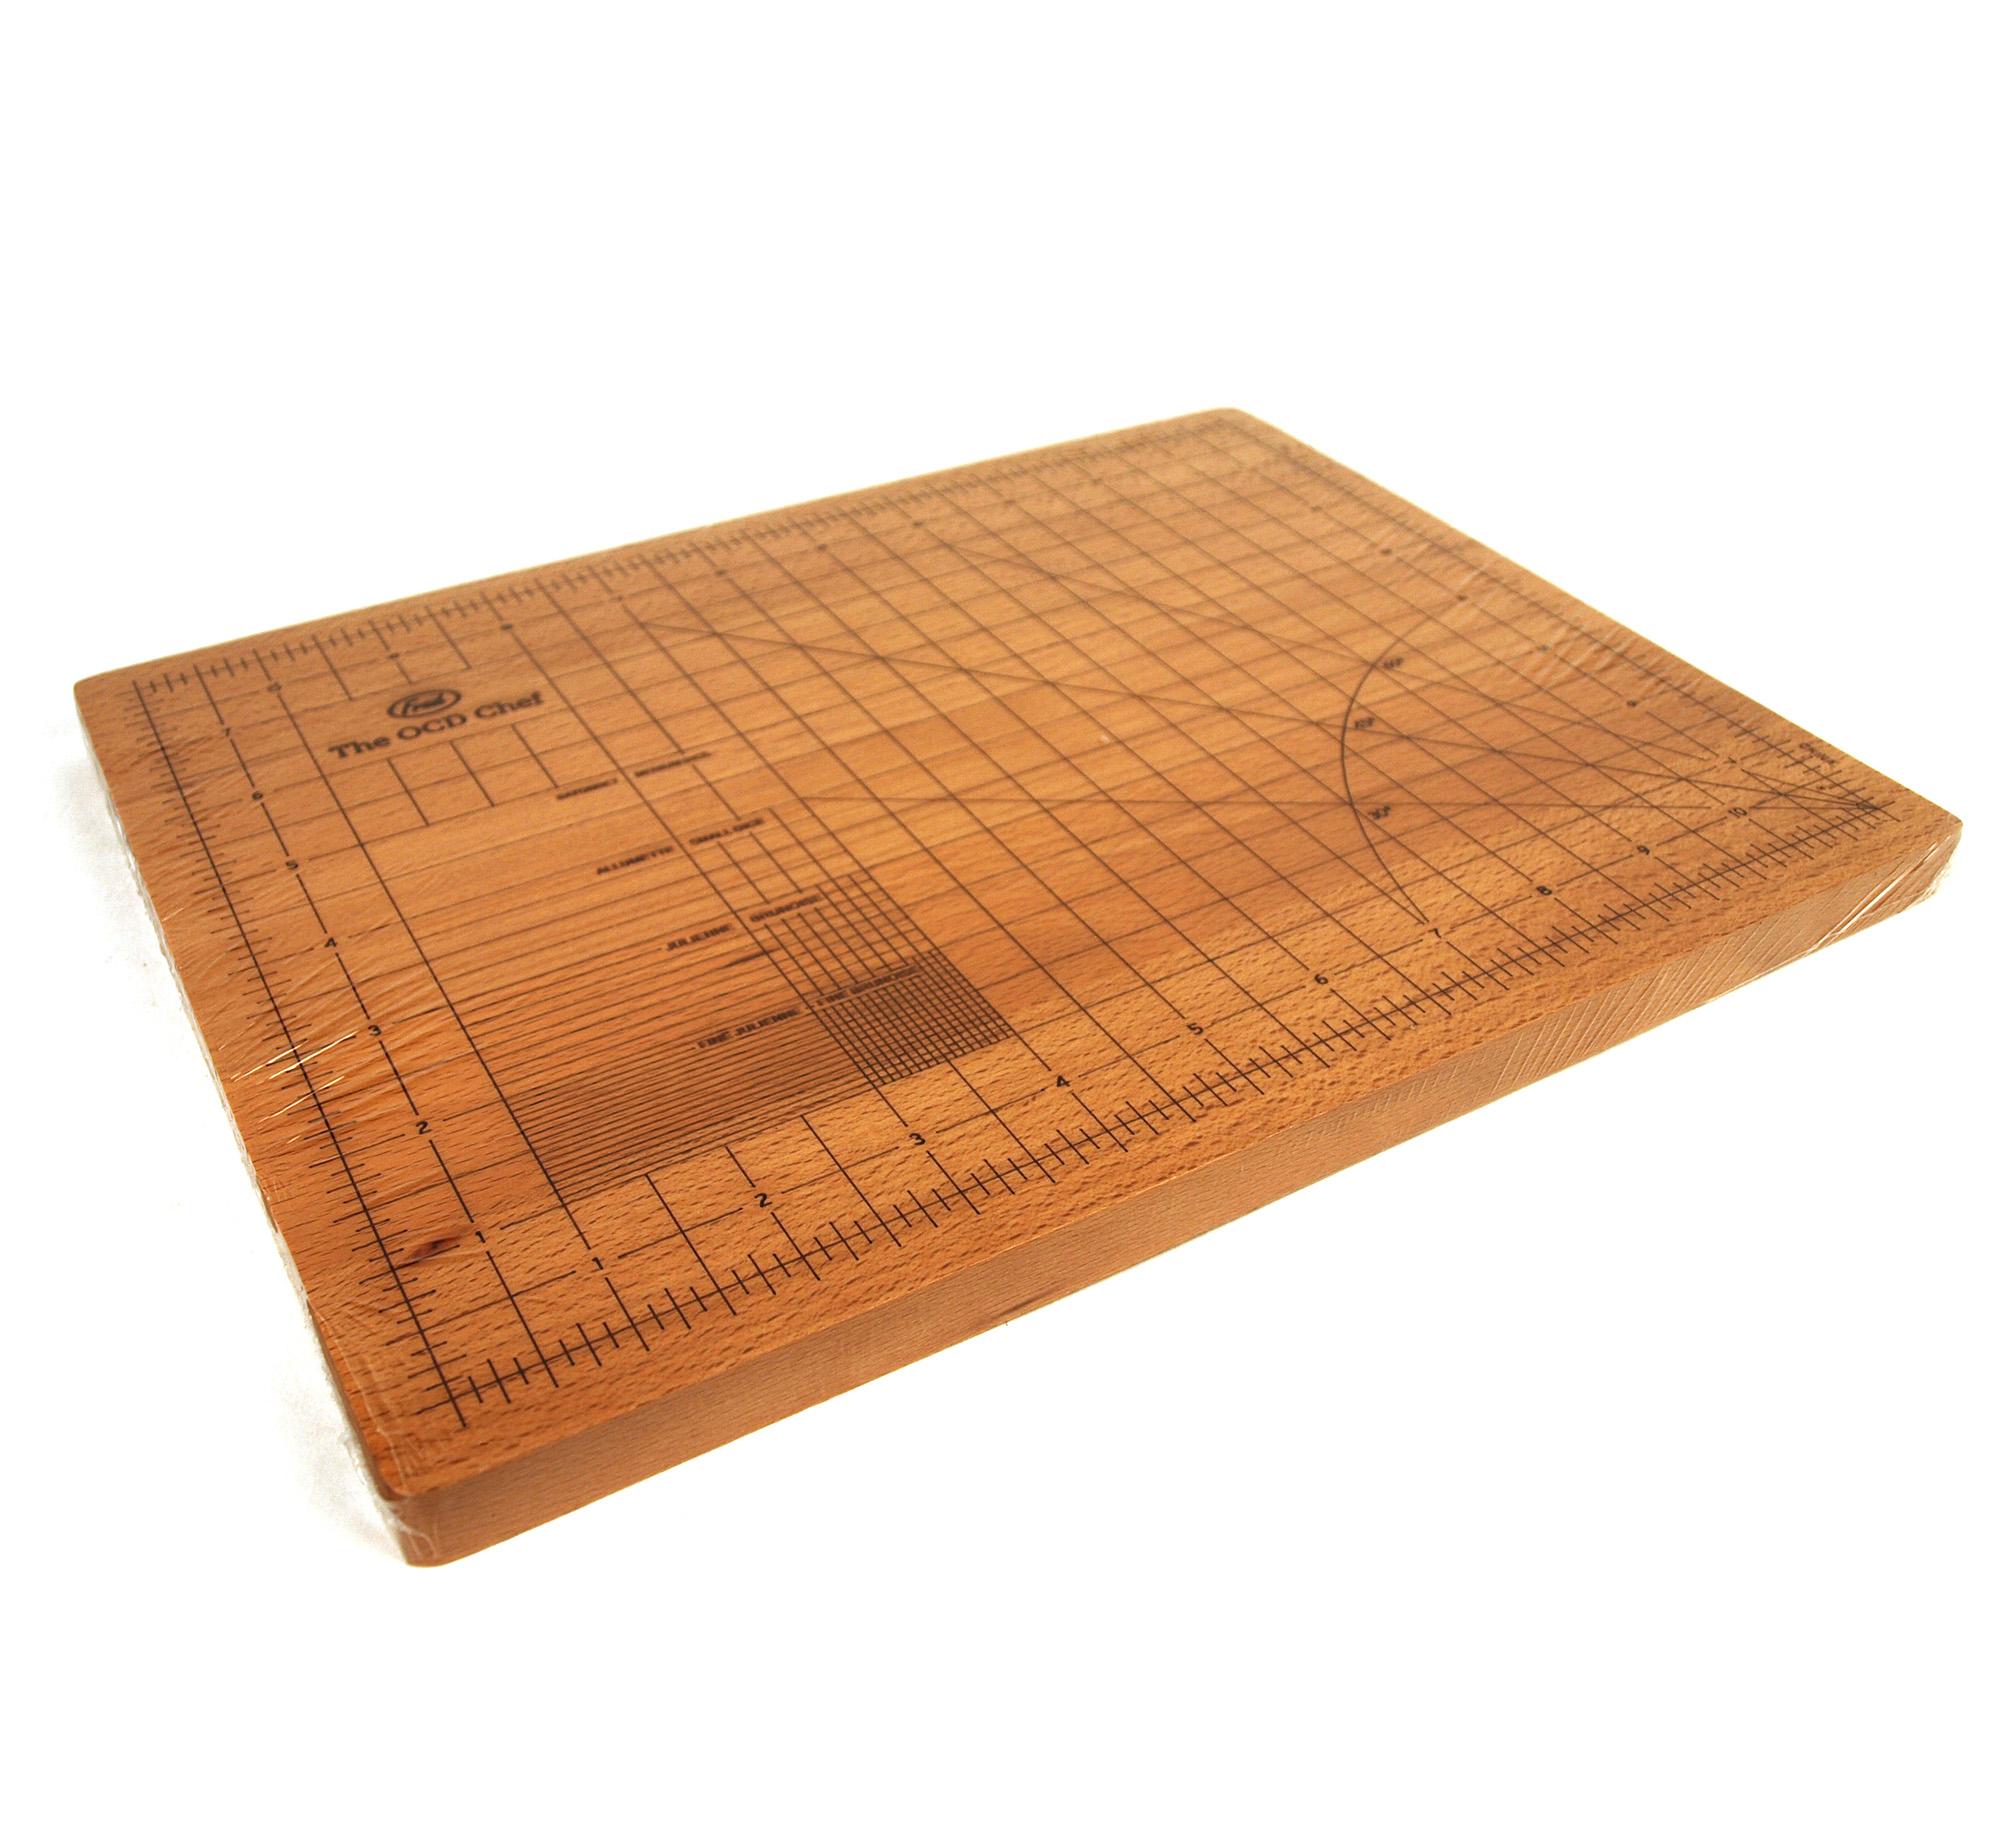 chopping board for baking - photo #37